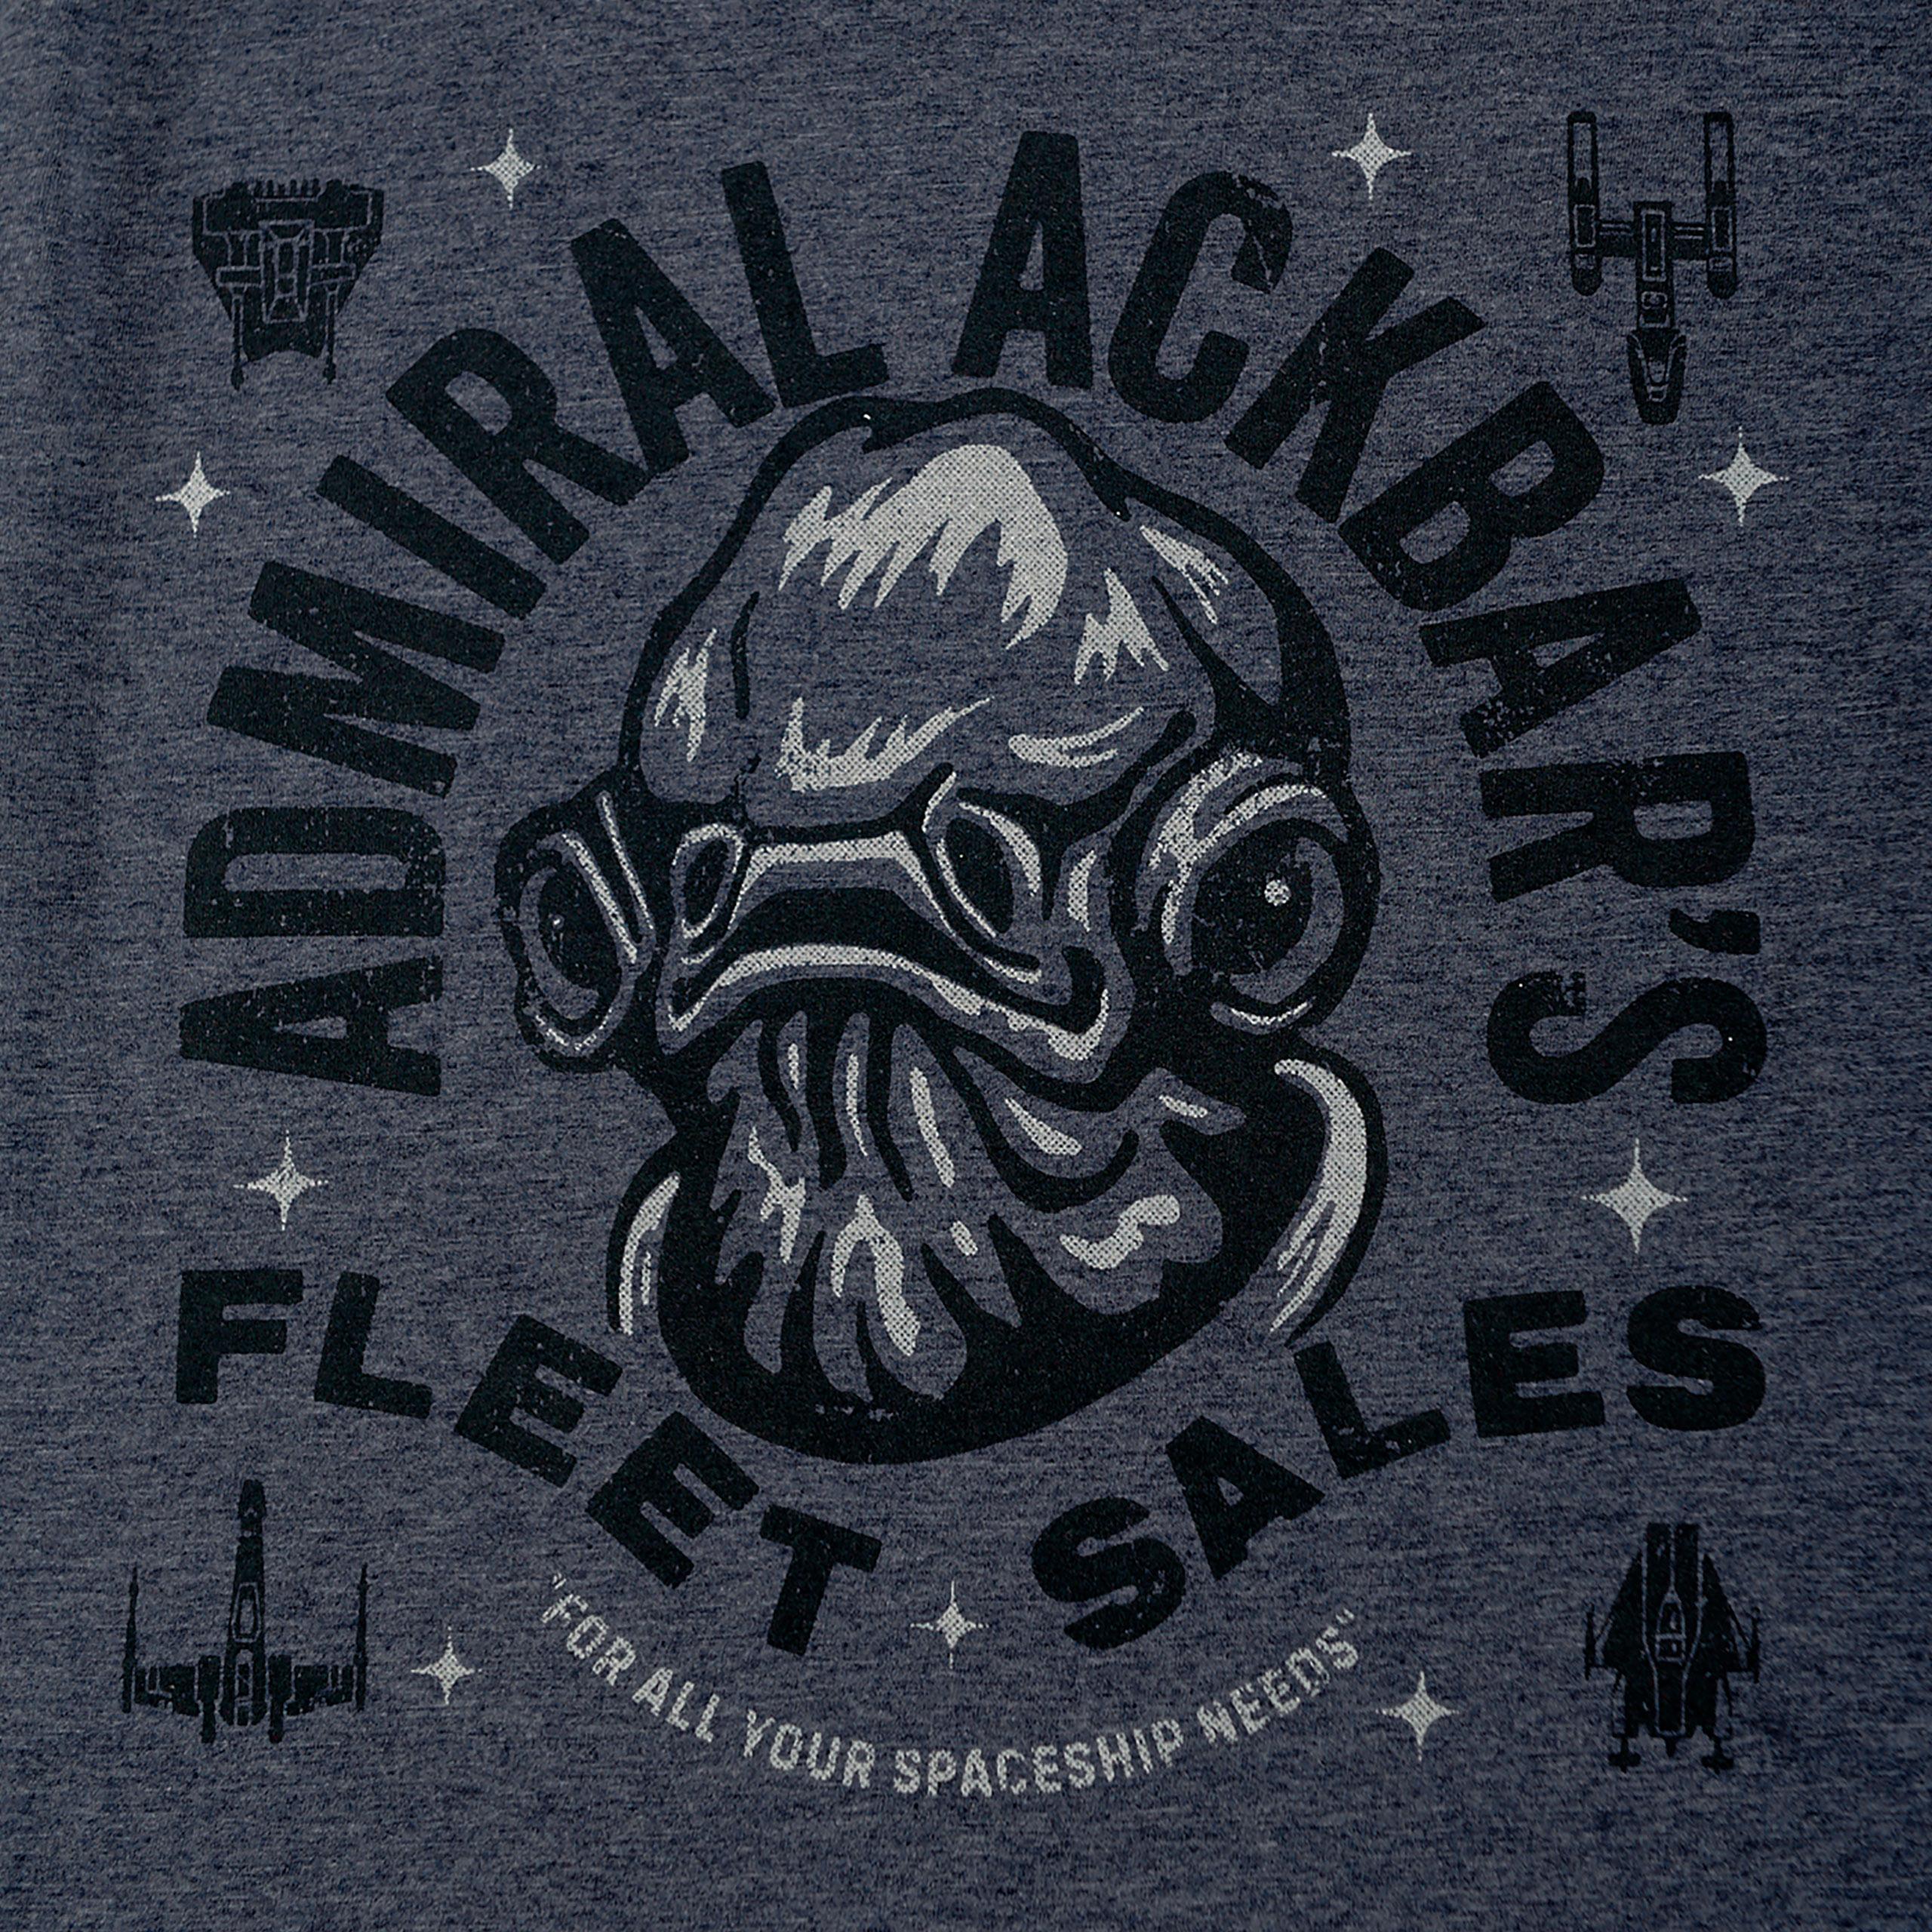 Star Wars - Admiral Ackbar's Fleet Sales T-Shirt blau